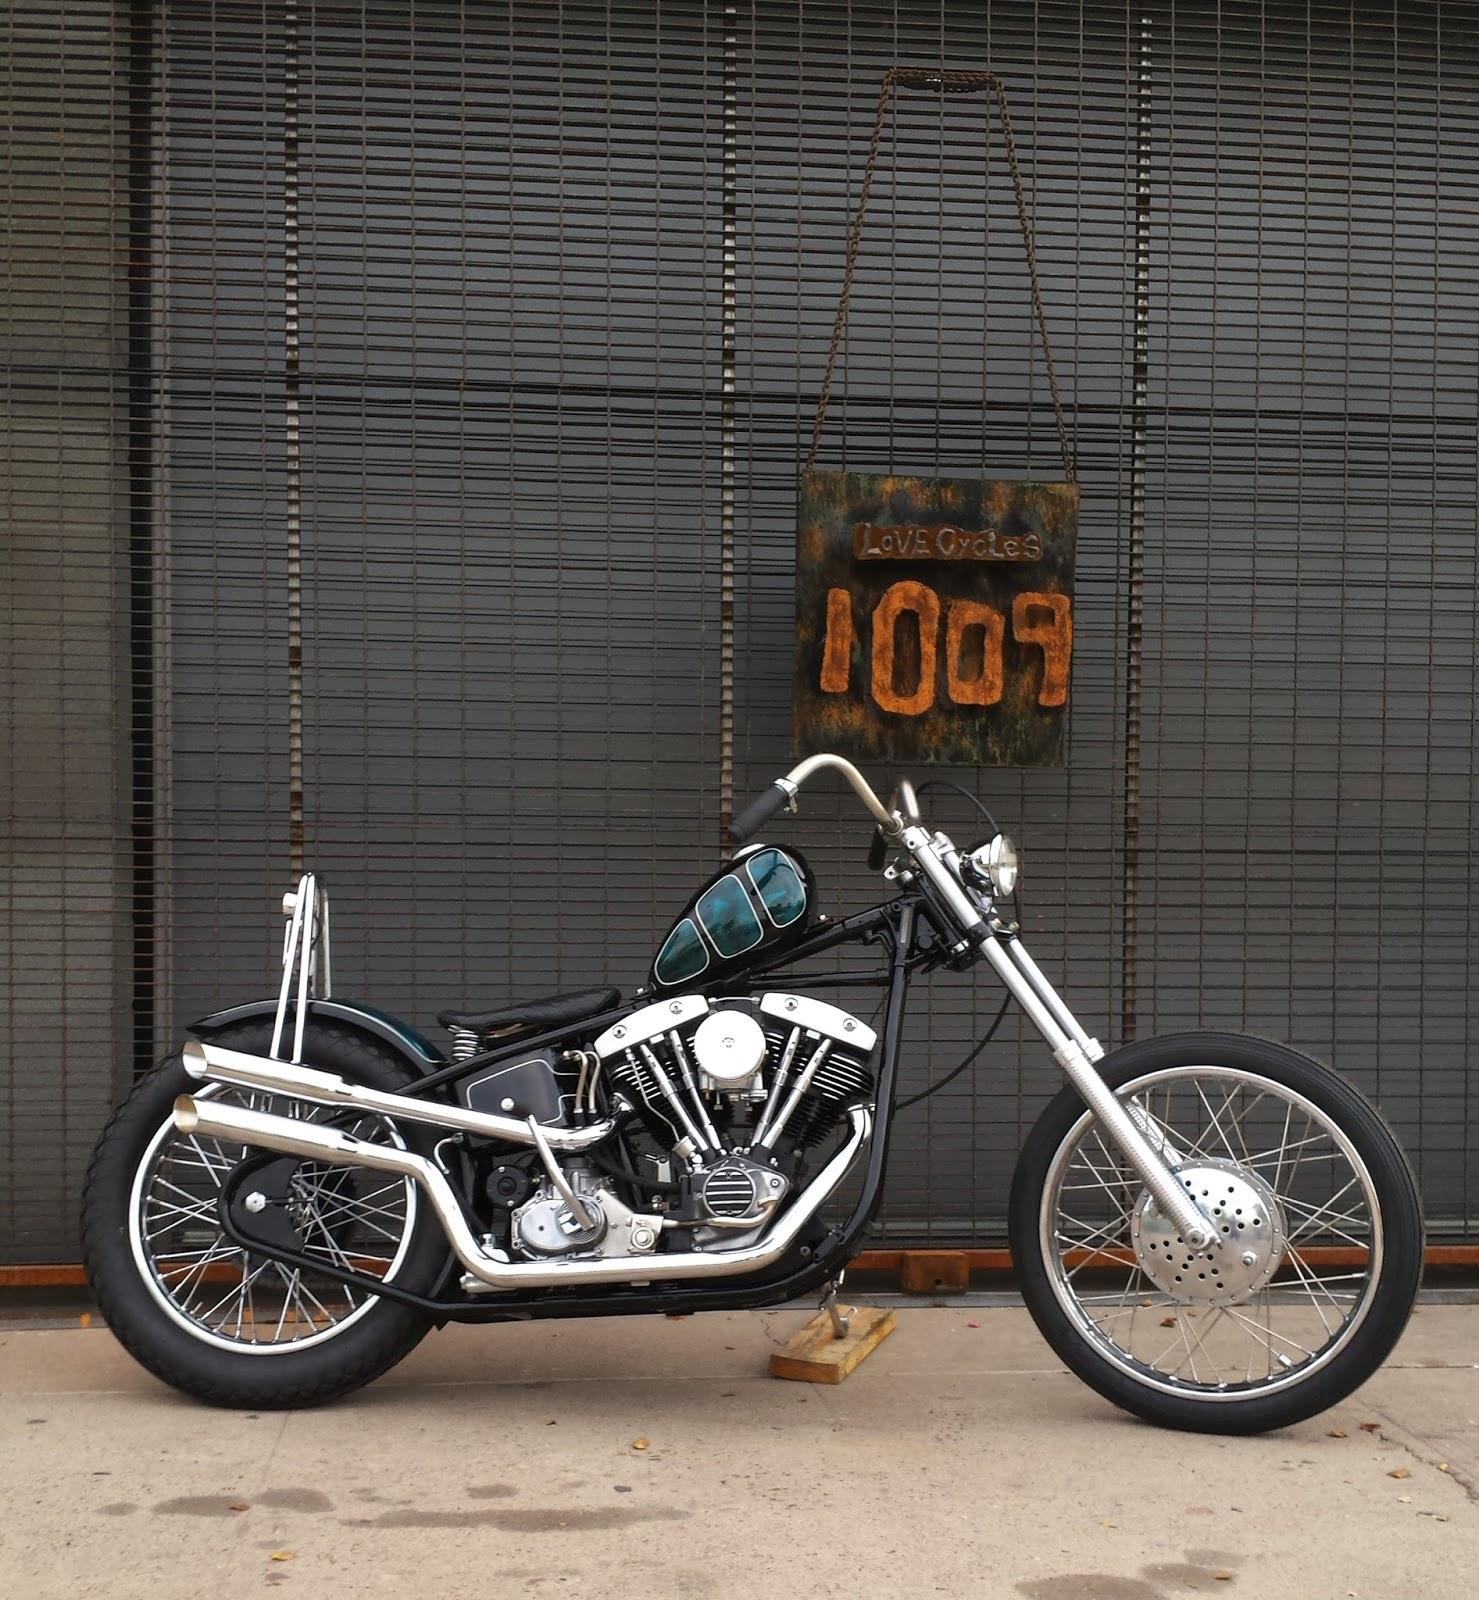 Hardsun Motorcycles 1982 Love Cycles Sturgis Chopper